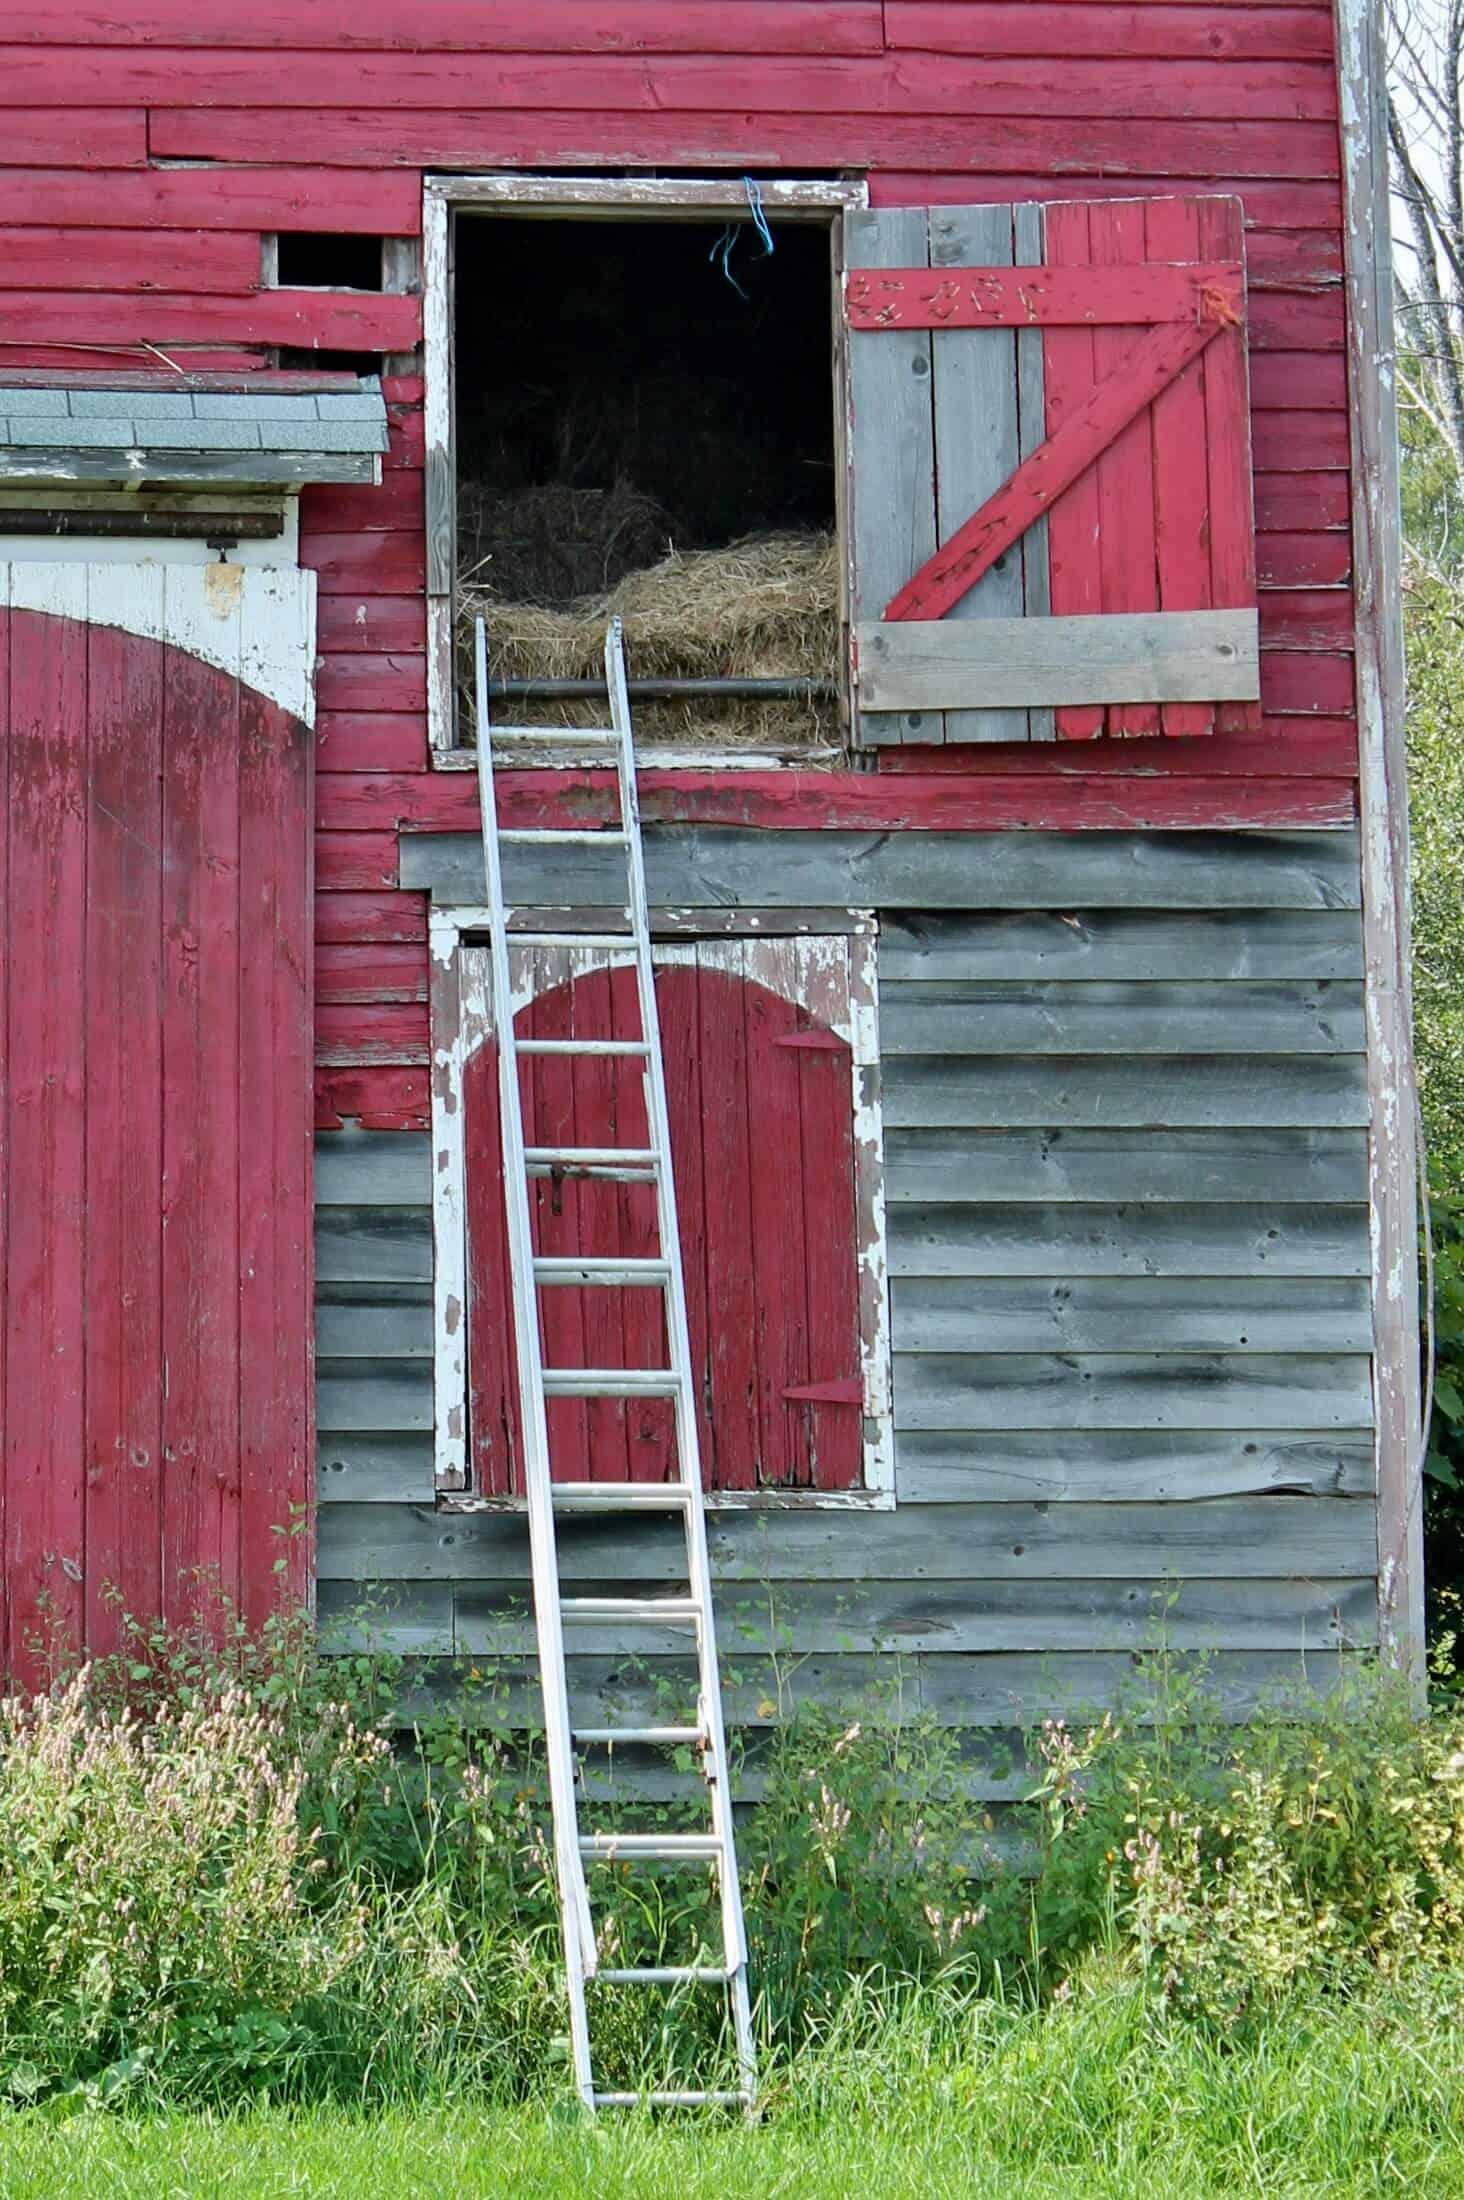 Close up of hay door on red barn